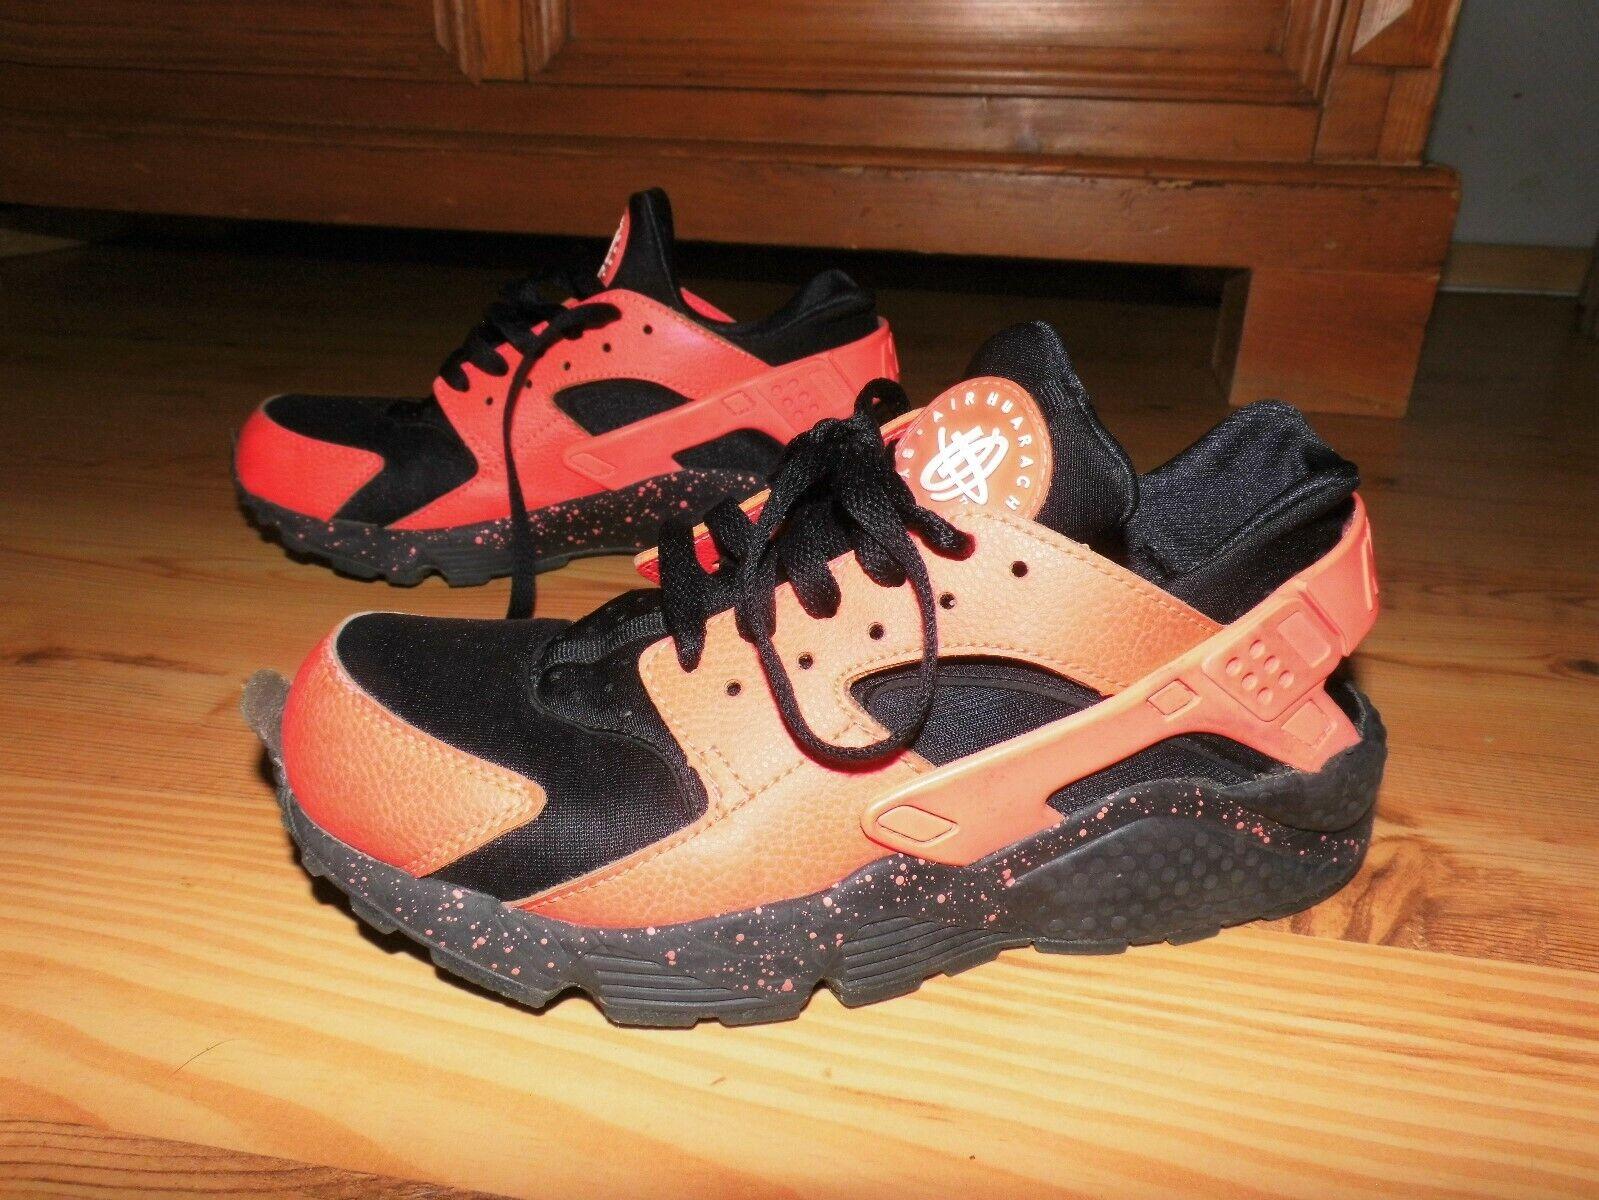 Nike Huarache Sneaker Turnschuhe Schuhe Boots Laufschuhe Gr.39 schwarz neon